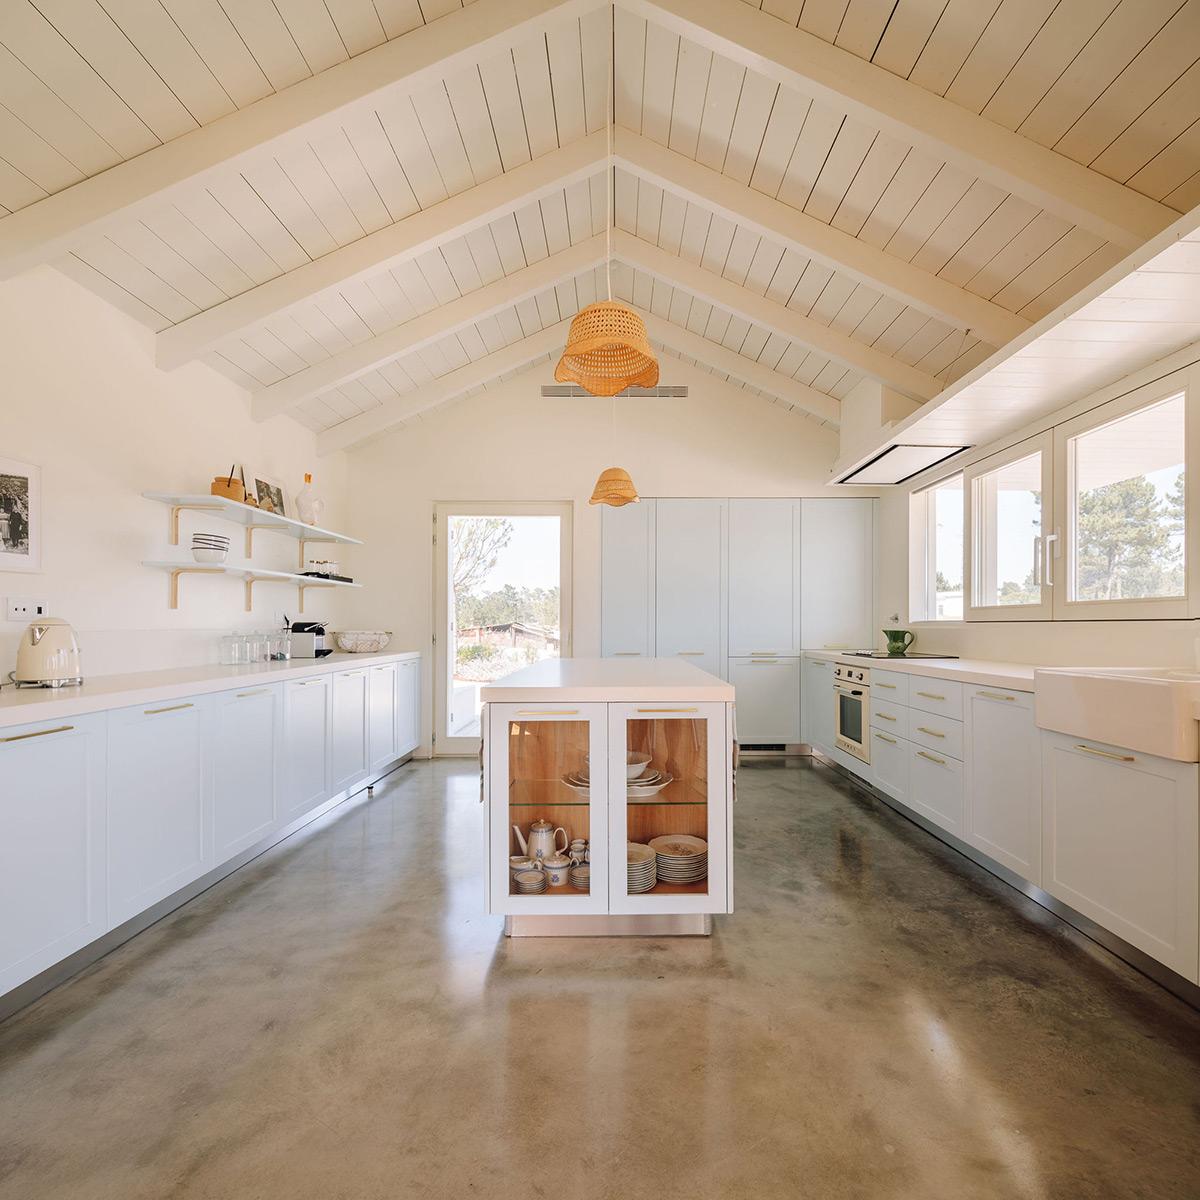 Casa-Comporta-Almeida-Fernandes-Arquitectura-Francisco-Nogueira-05